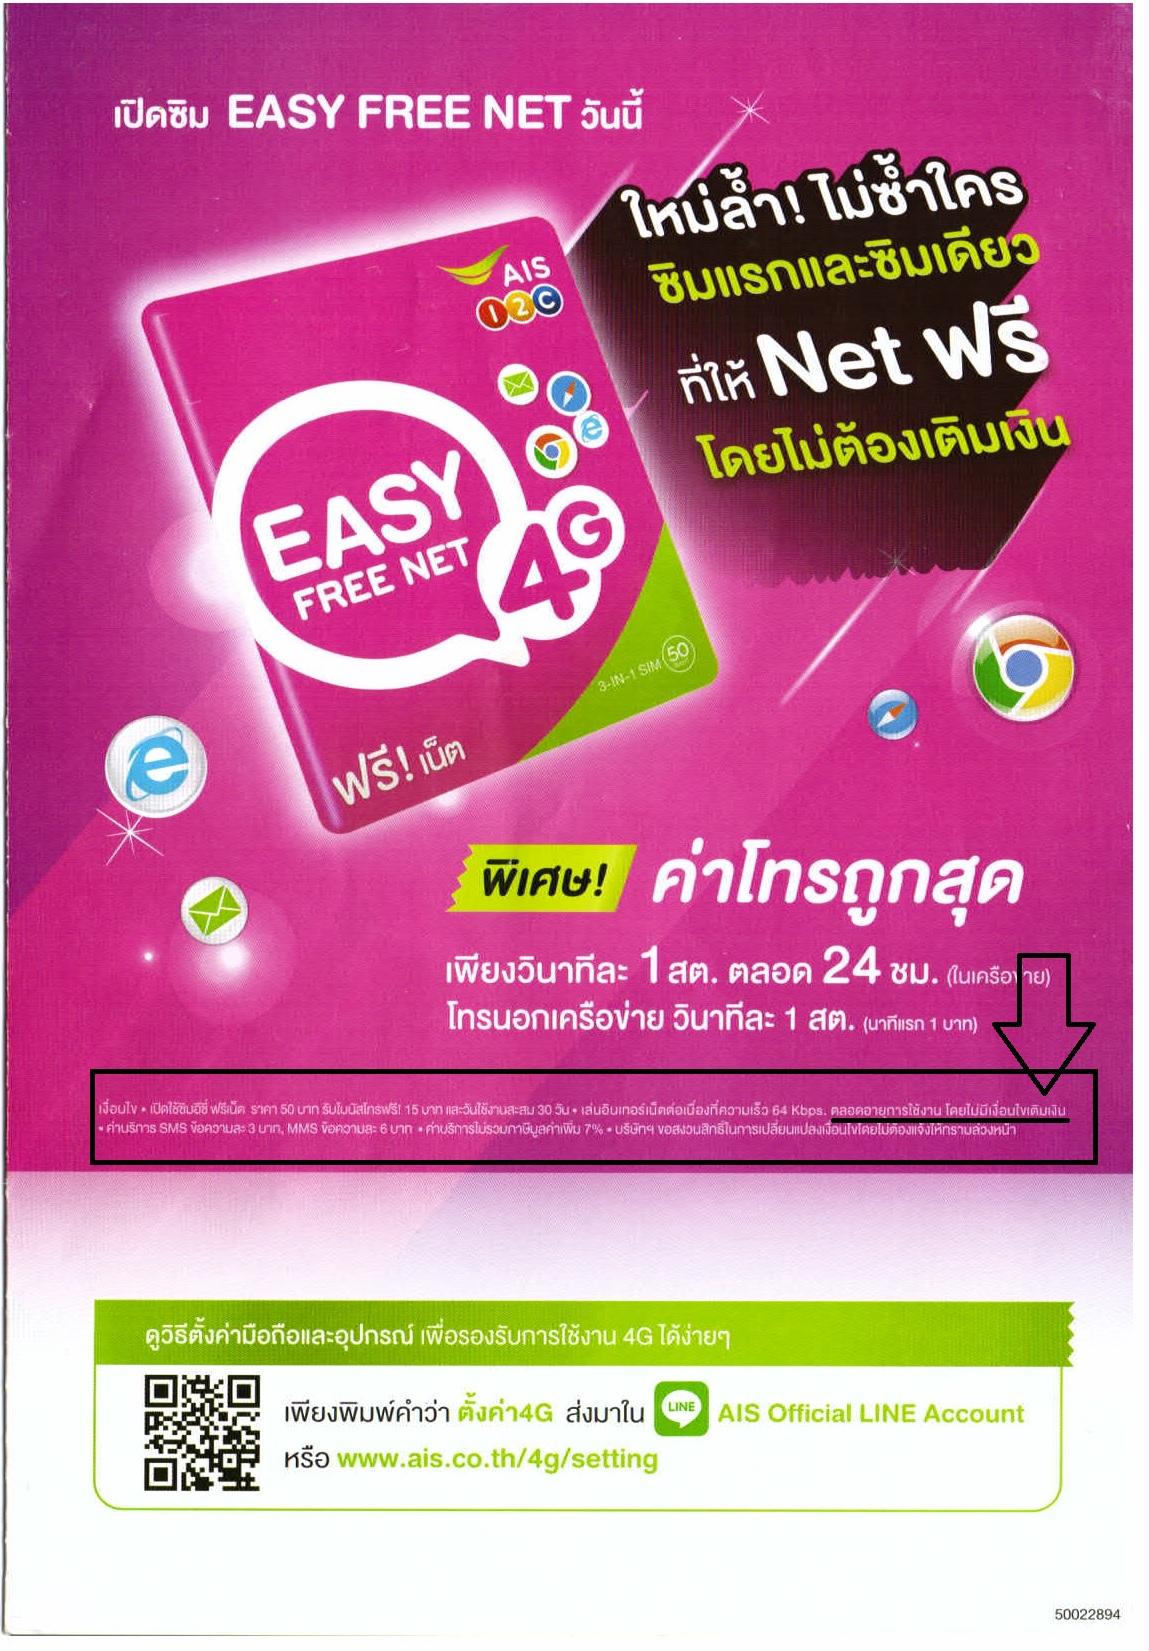 AIS - EASY FREE NET 4G (SIM) - ให้ Net ฟรี โดยไม่ต้องเติม